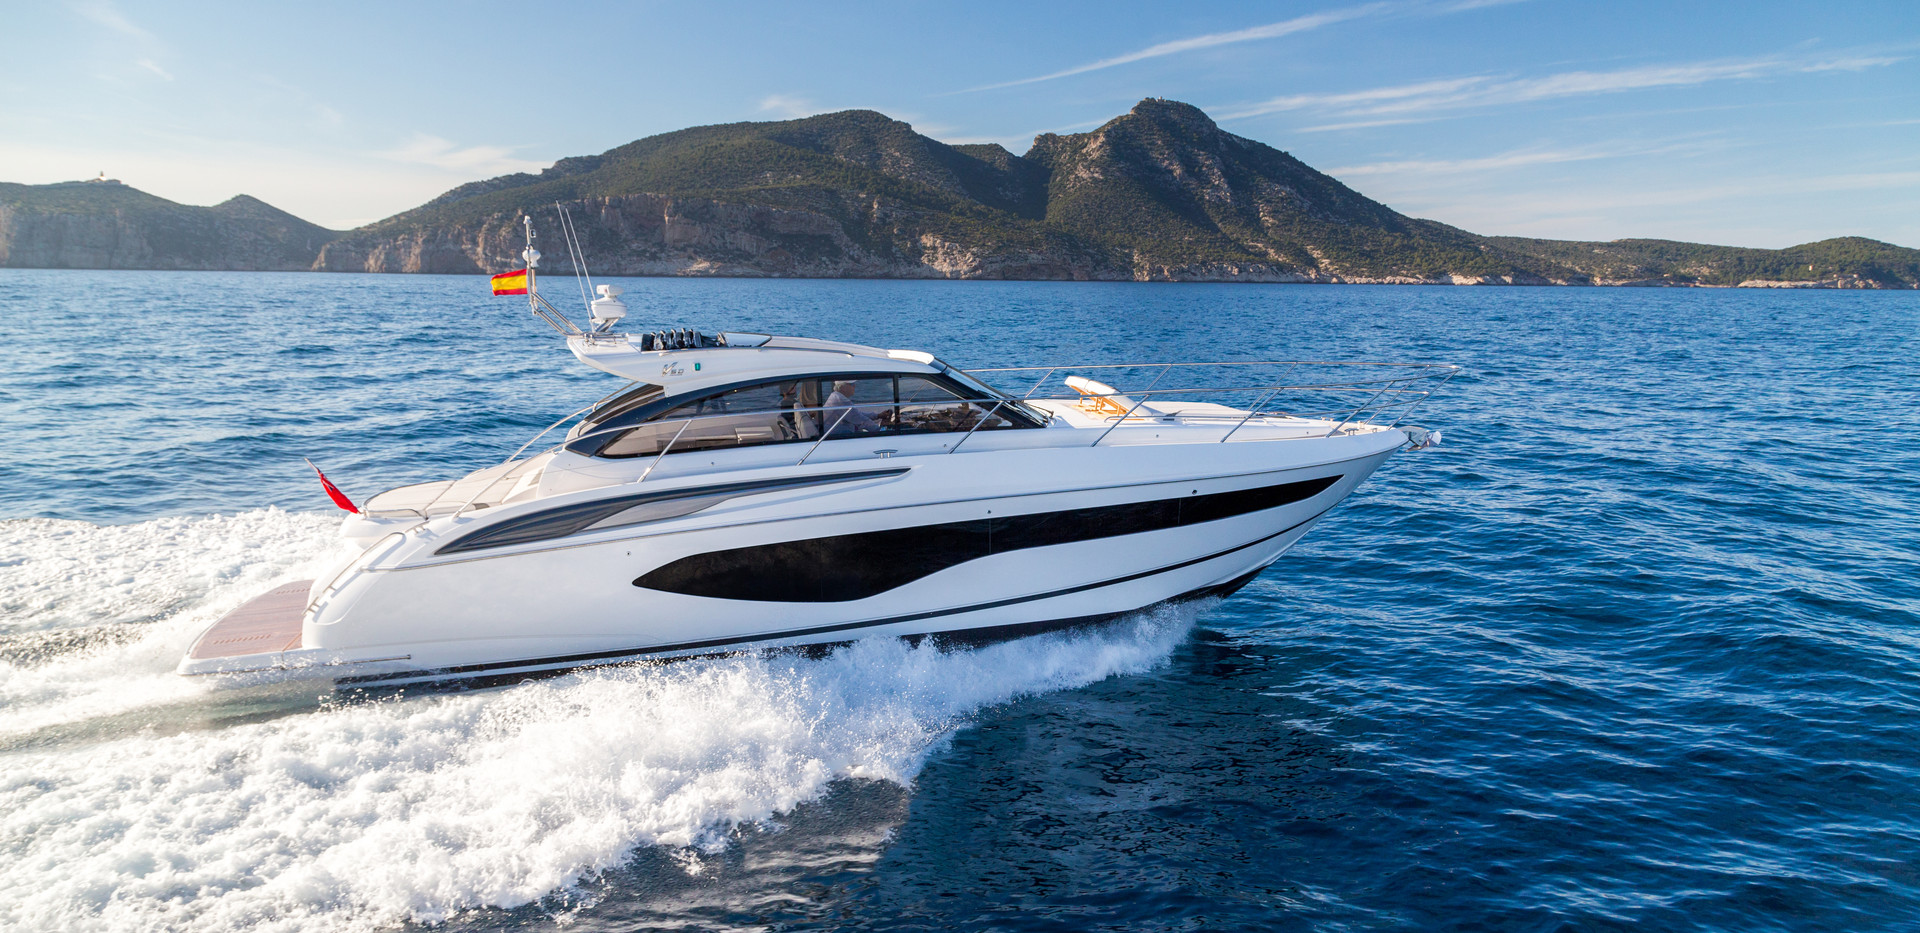 v50-open-exterior-white-hull-3Abromowitz